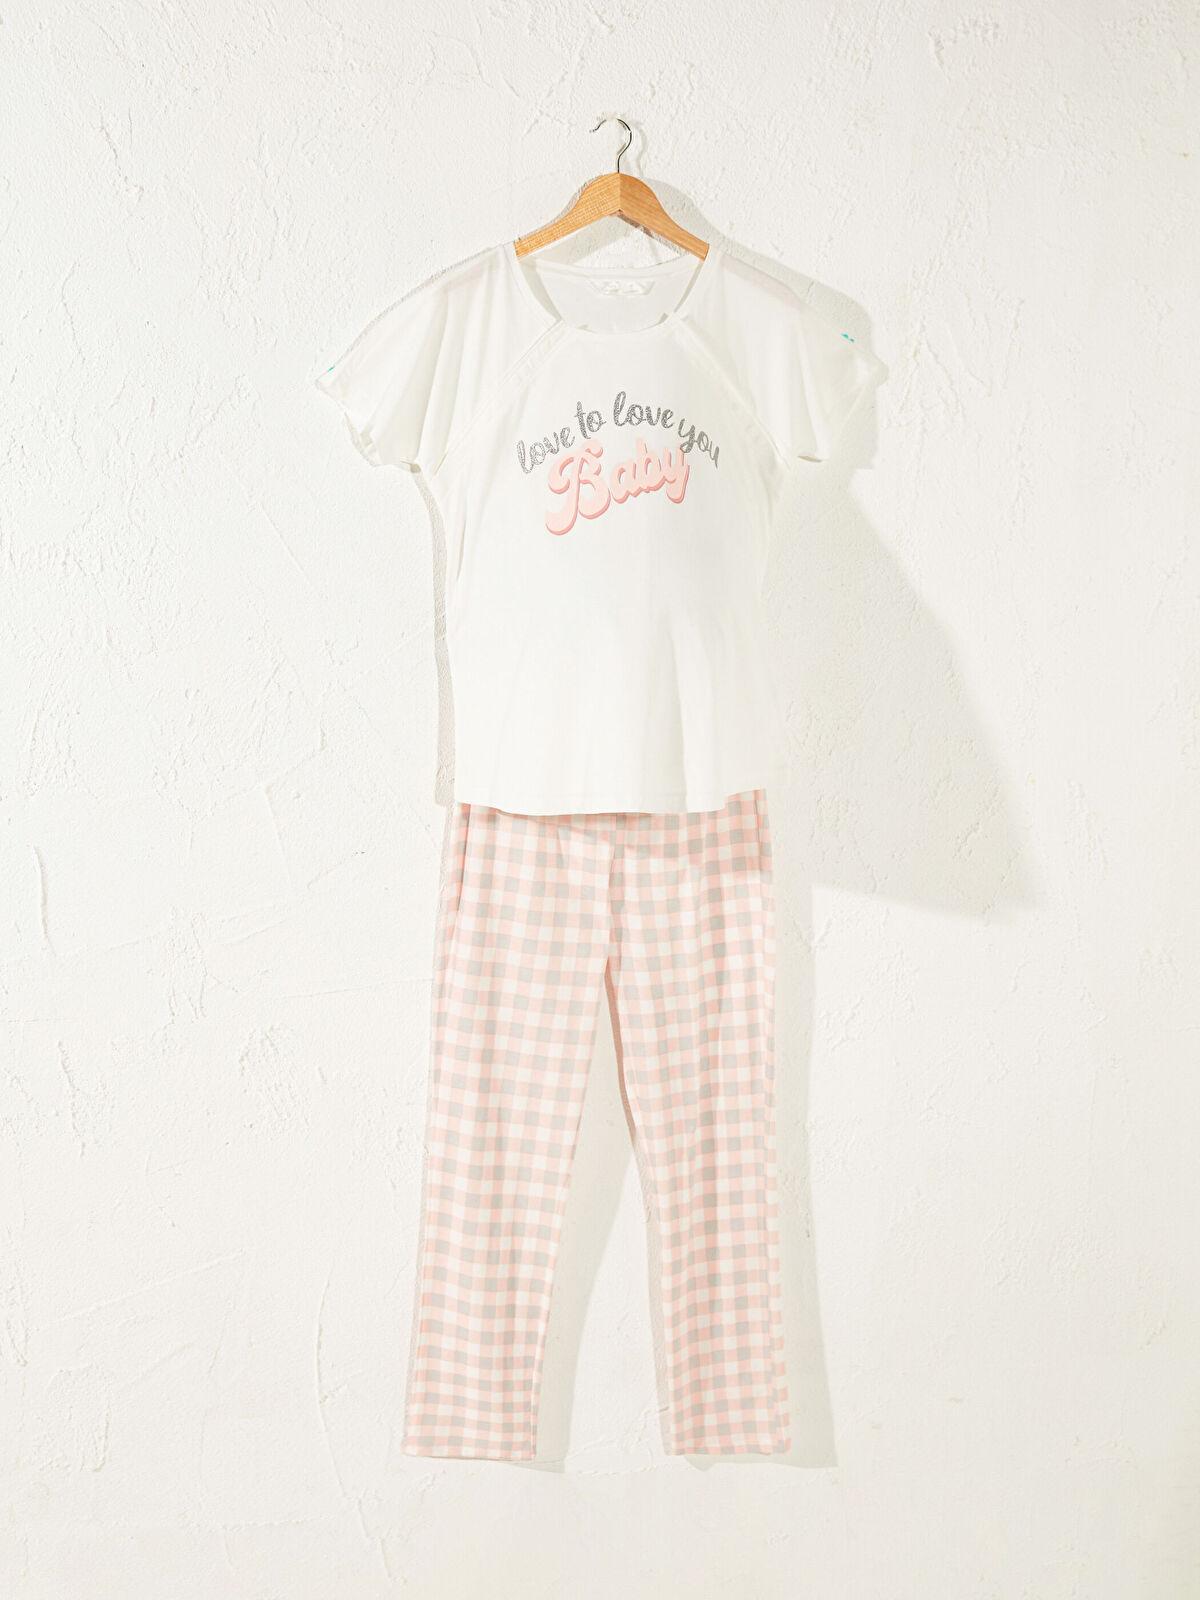 Slogan Baskılı Pamuklu Hamile Pijama Takımı - LC WAIKIKI